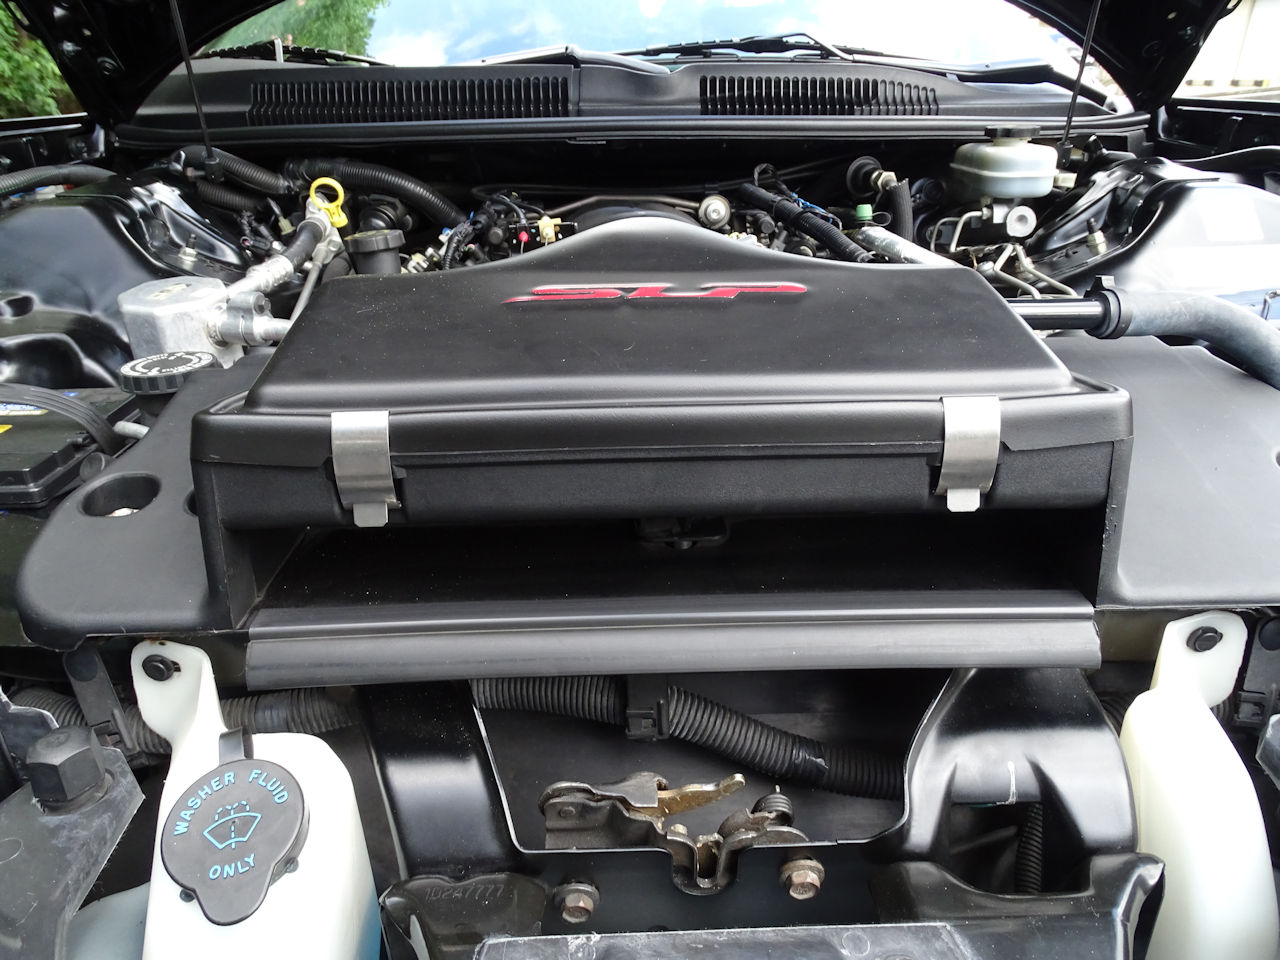 2001 Pontiac Firebird 85